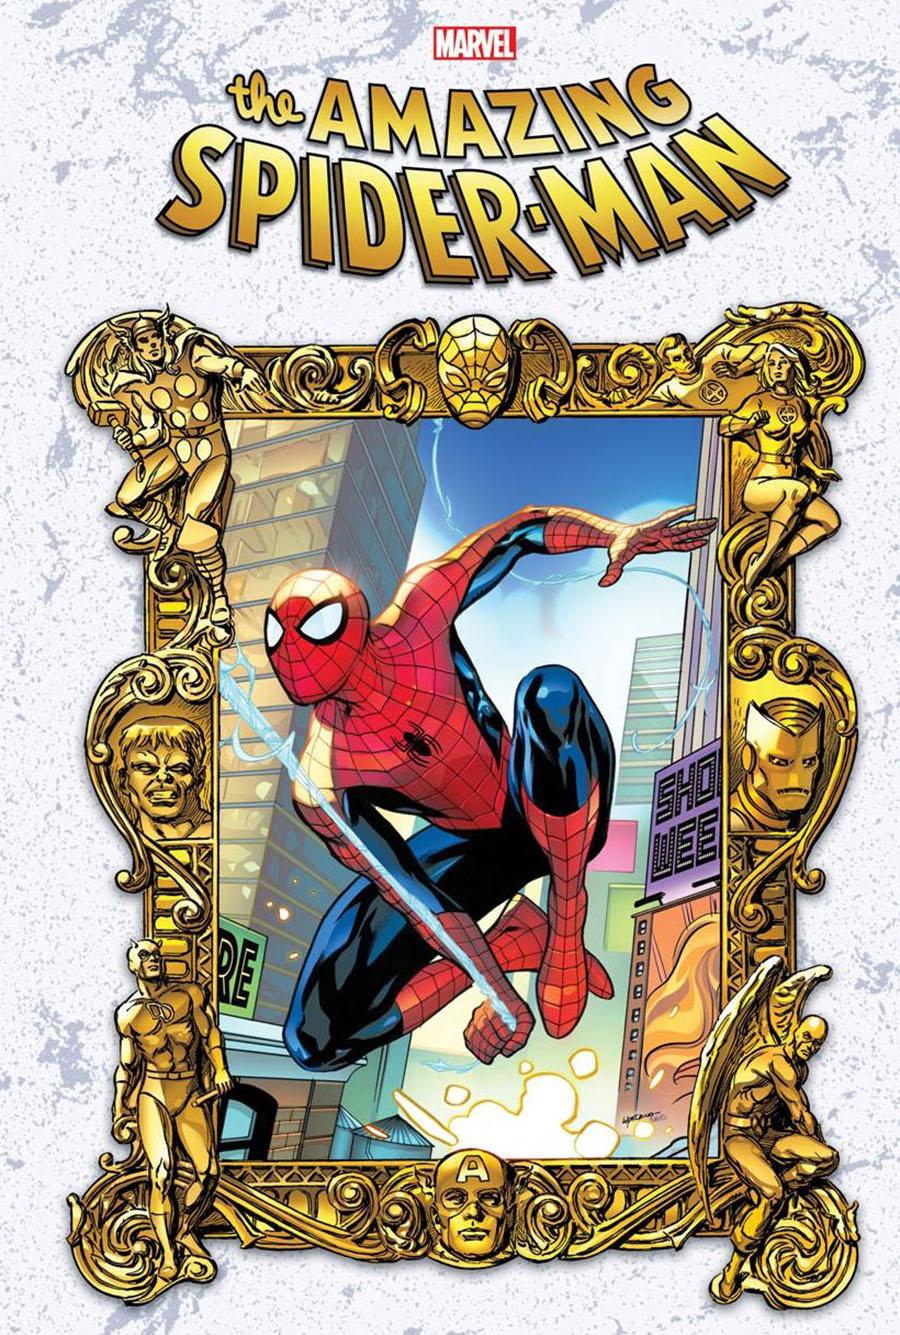 Amazing Spider-Man Vol 5 #59 Cover C Variant Emanuela Lupacchino Masterworks Cover